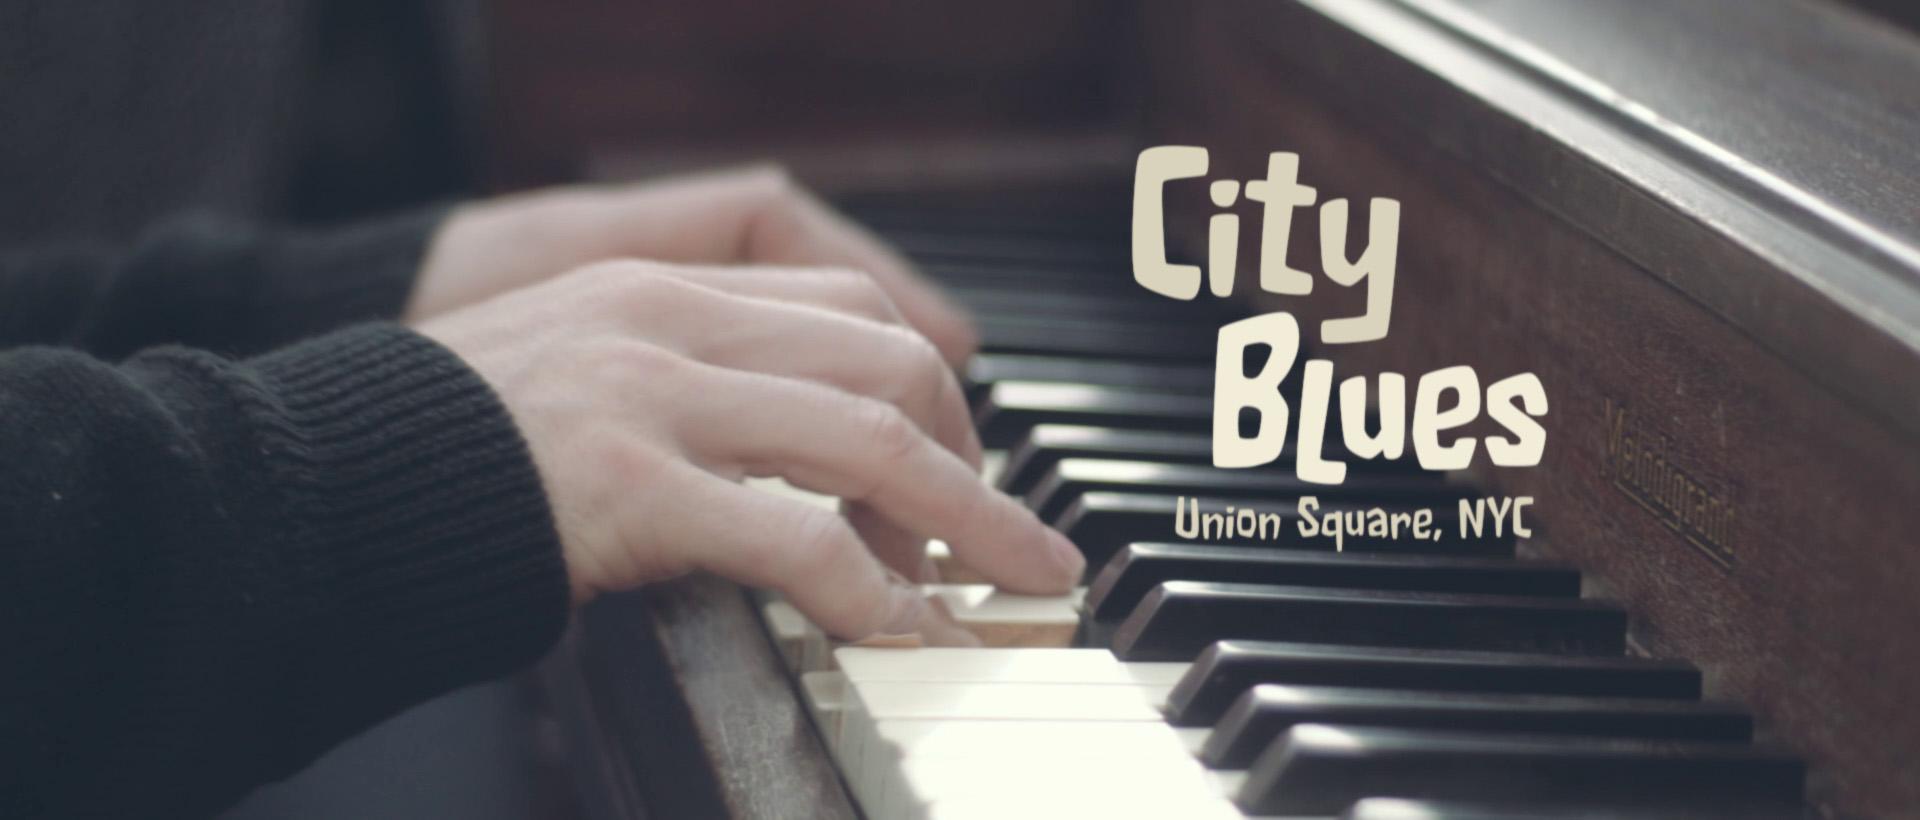 City_Blues_By_Stanley_Hsu.jpg